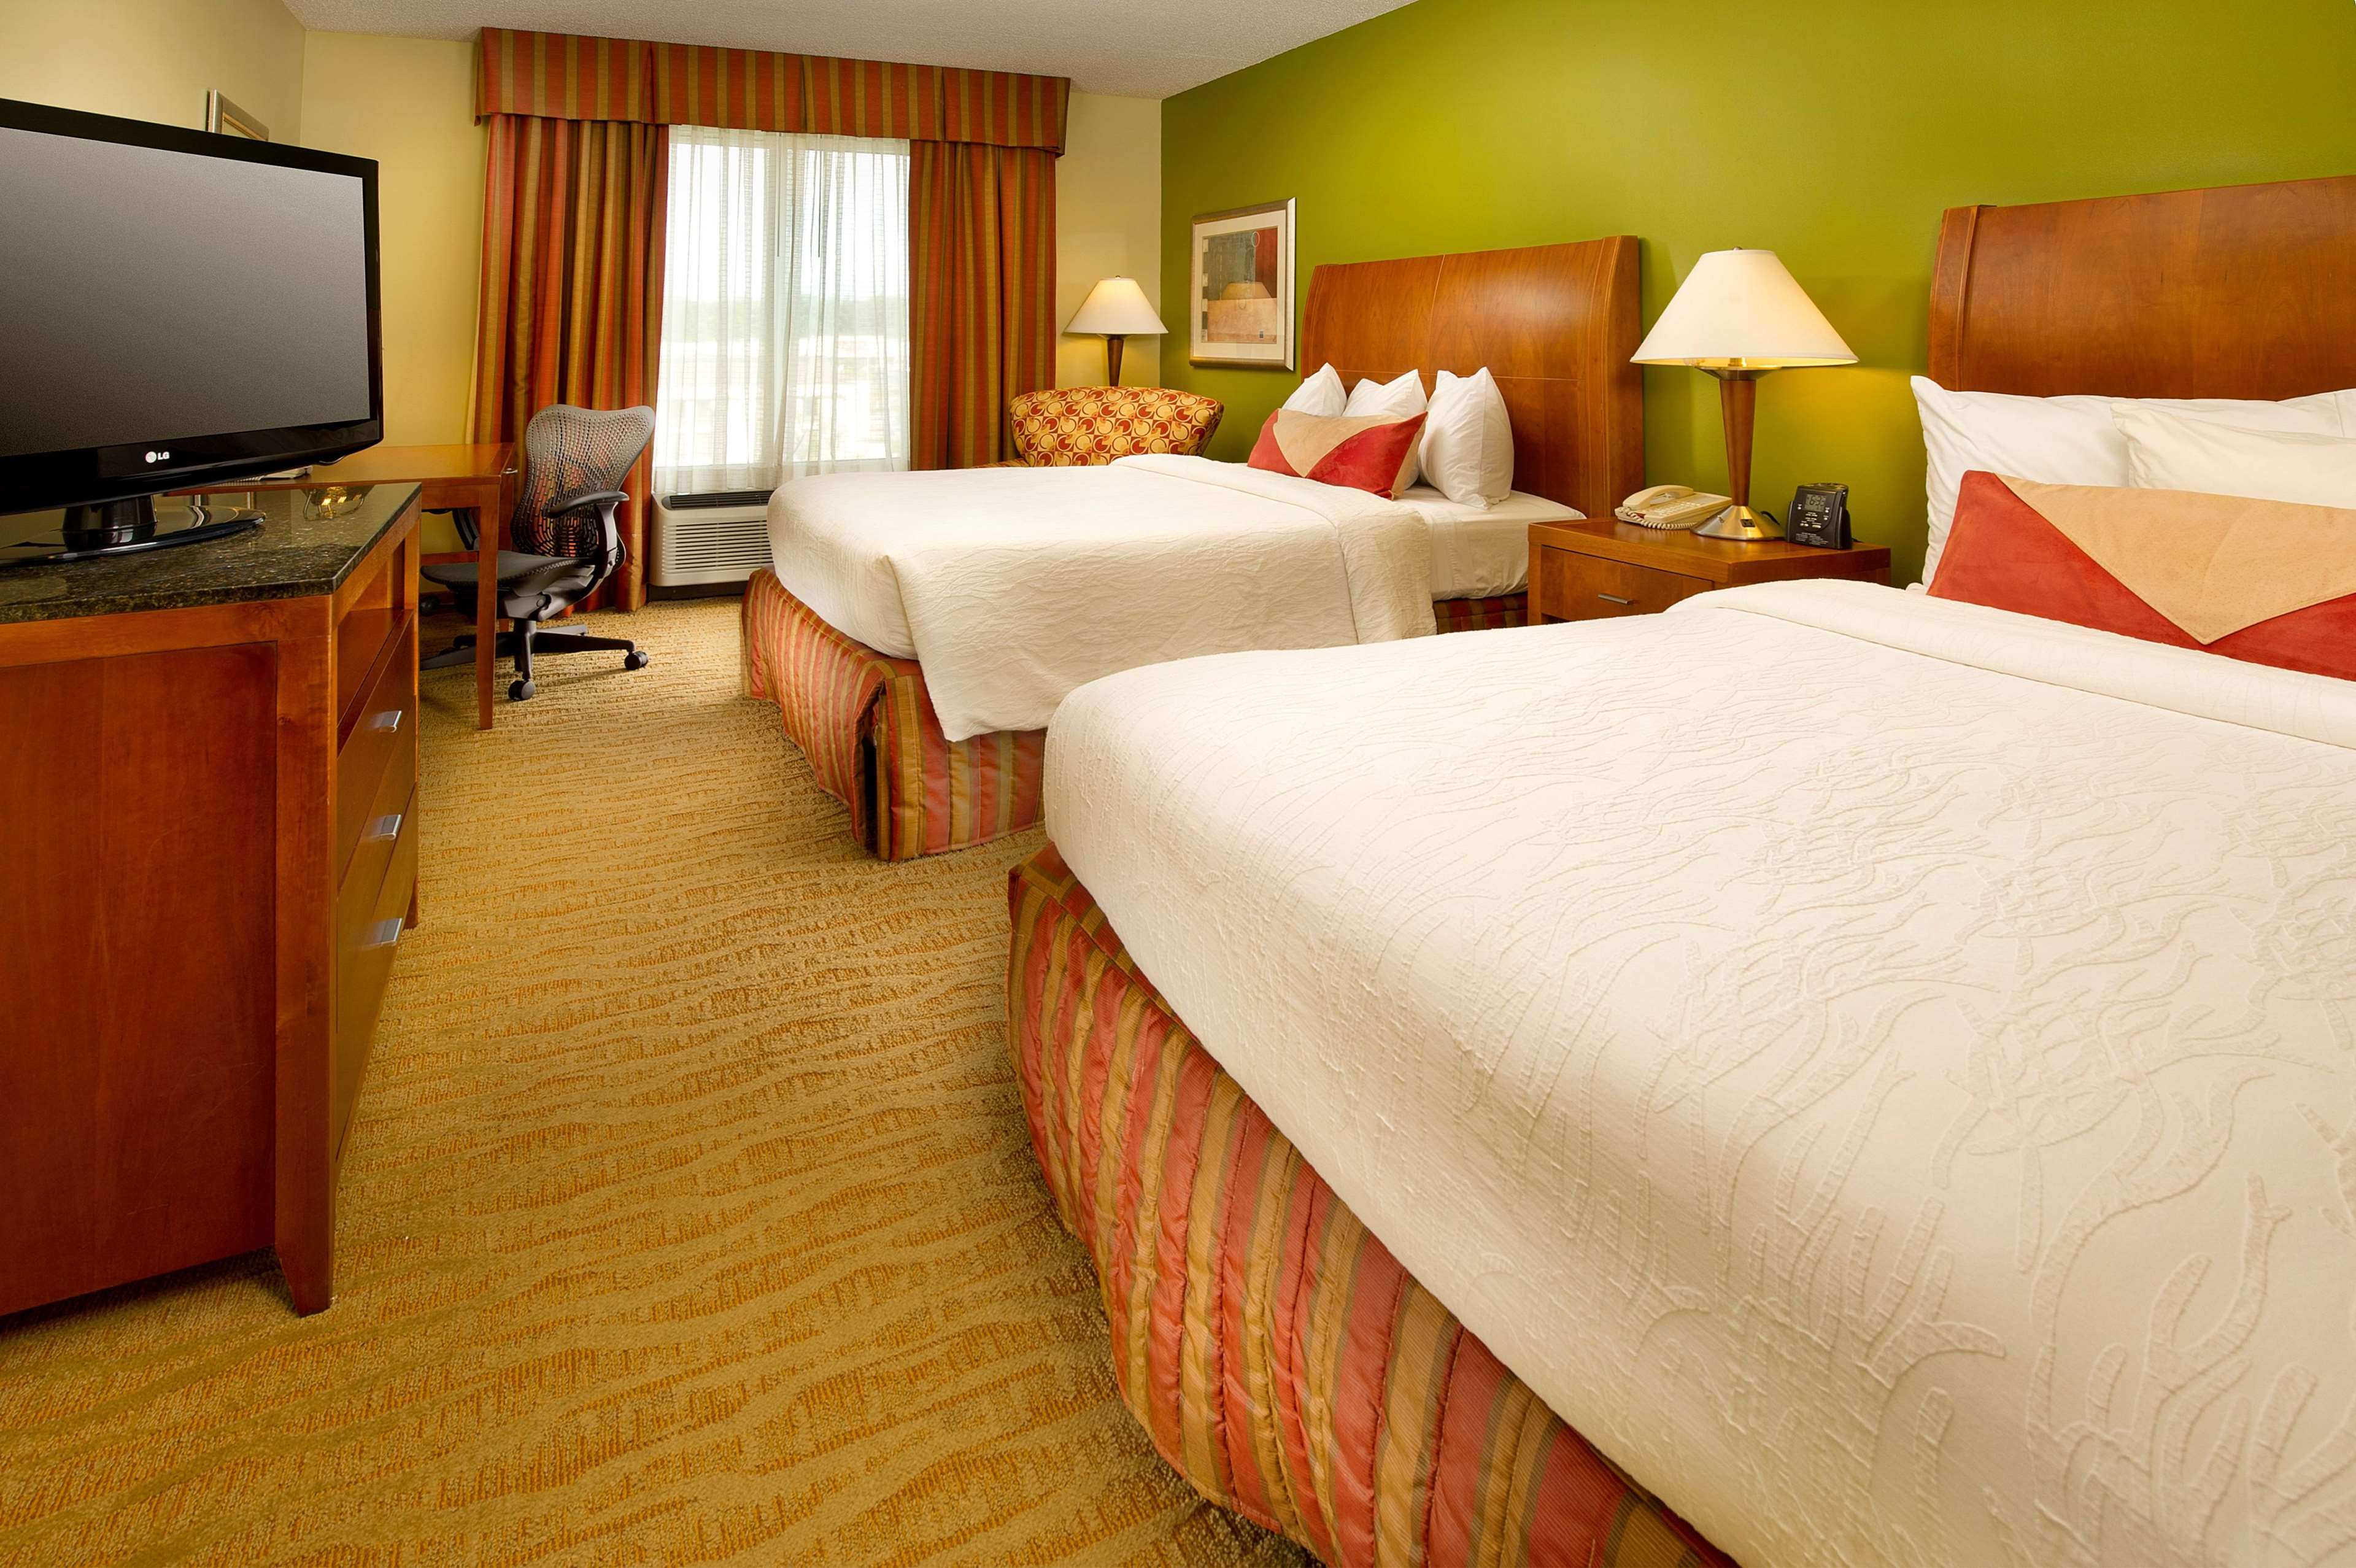 Hilton Garden Inn Atlanta NW/Kennesaw Town Center image 1